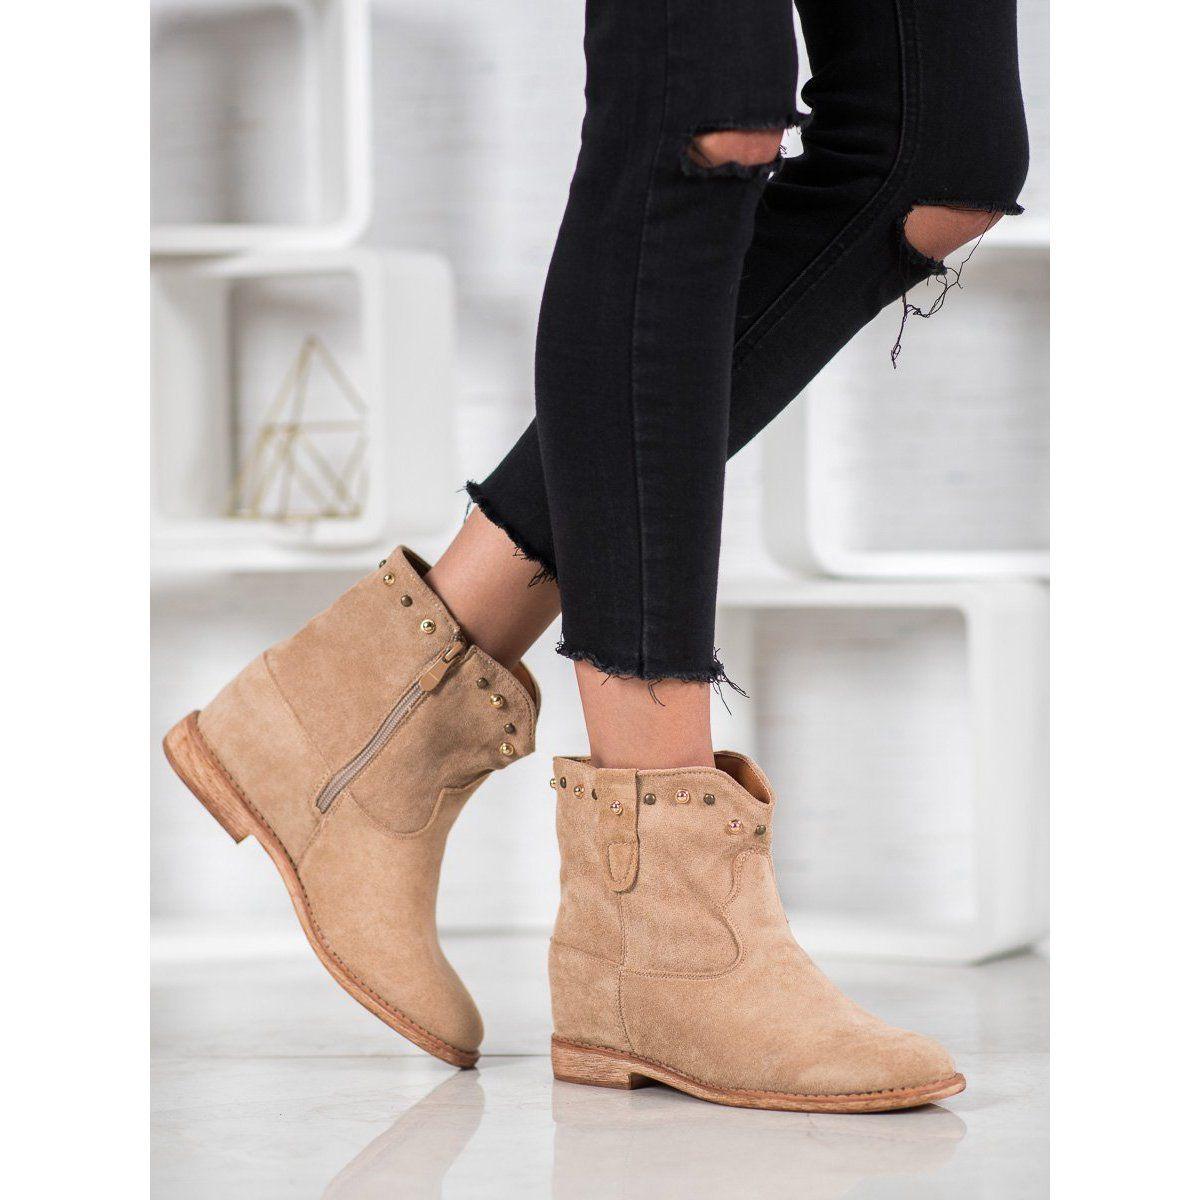 Bella Paris Zamszowe Botki Z Dzetami Wielokolorowe Boots Boot Shoes Women Shoe Boots